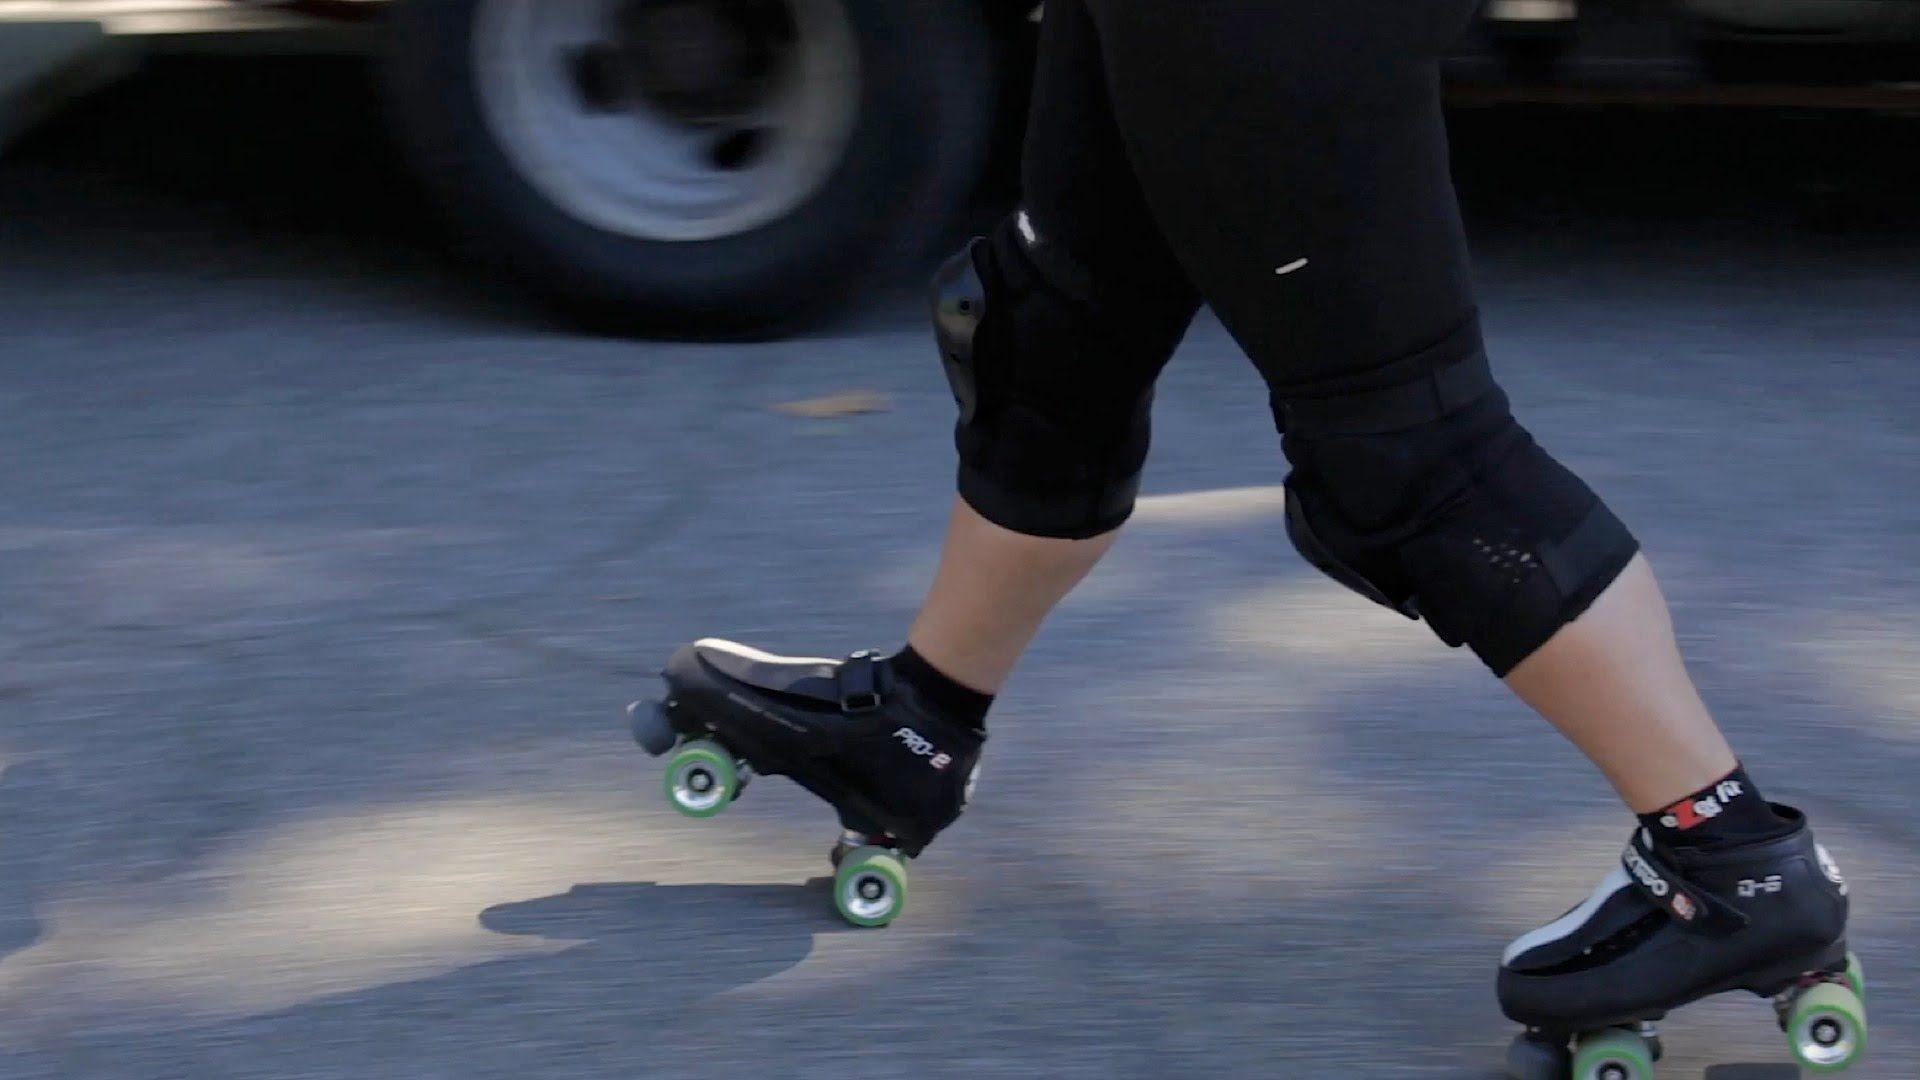 Roller skates videos youtube - 1000 Images About Let S Roller Boogie On Pinterest Roller Derby Rompers And Ga Ga